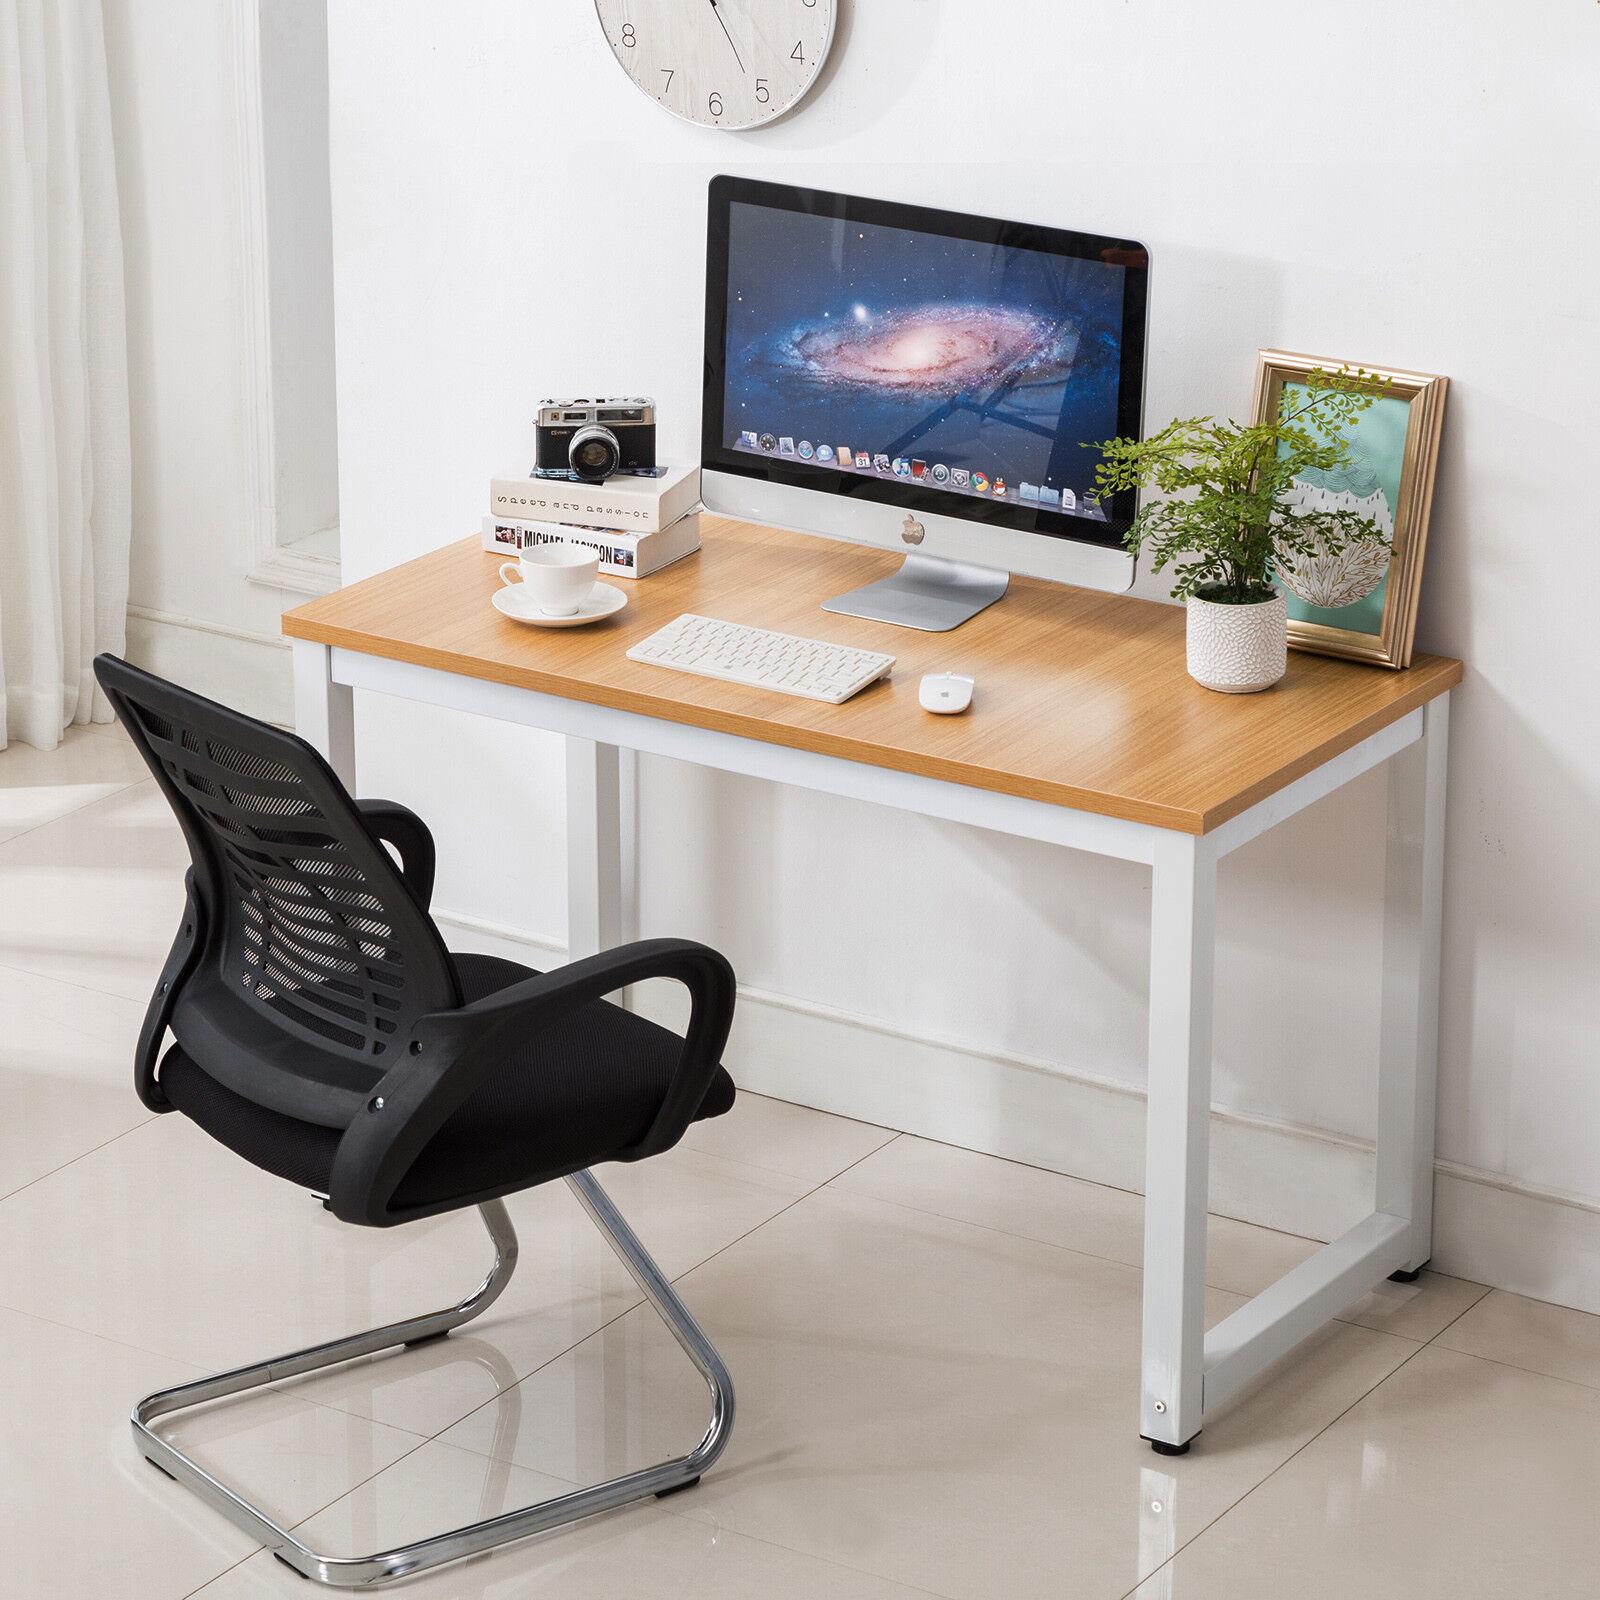 Computer Desk PC Laptop Table Workstation Home Office Furniture  Board